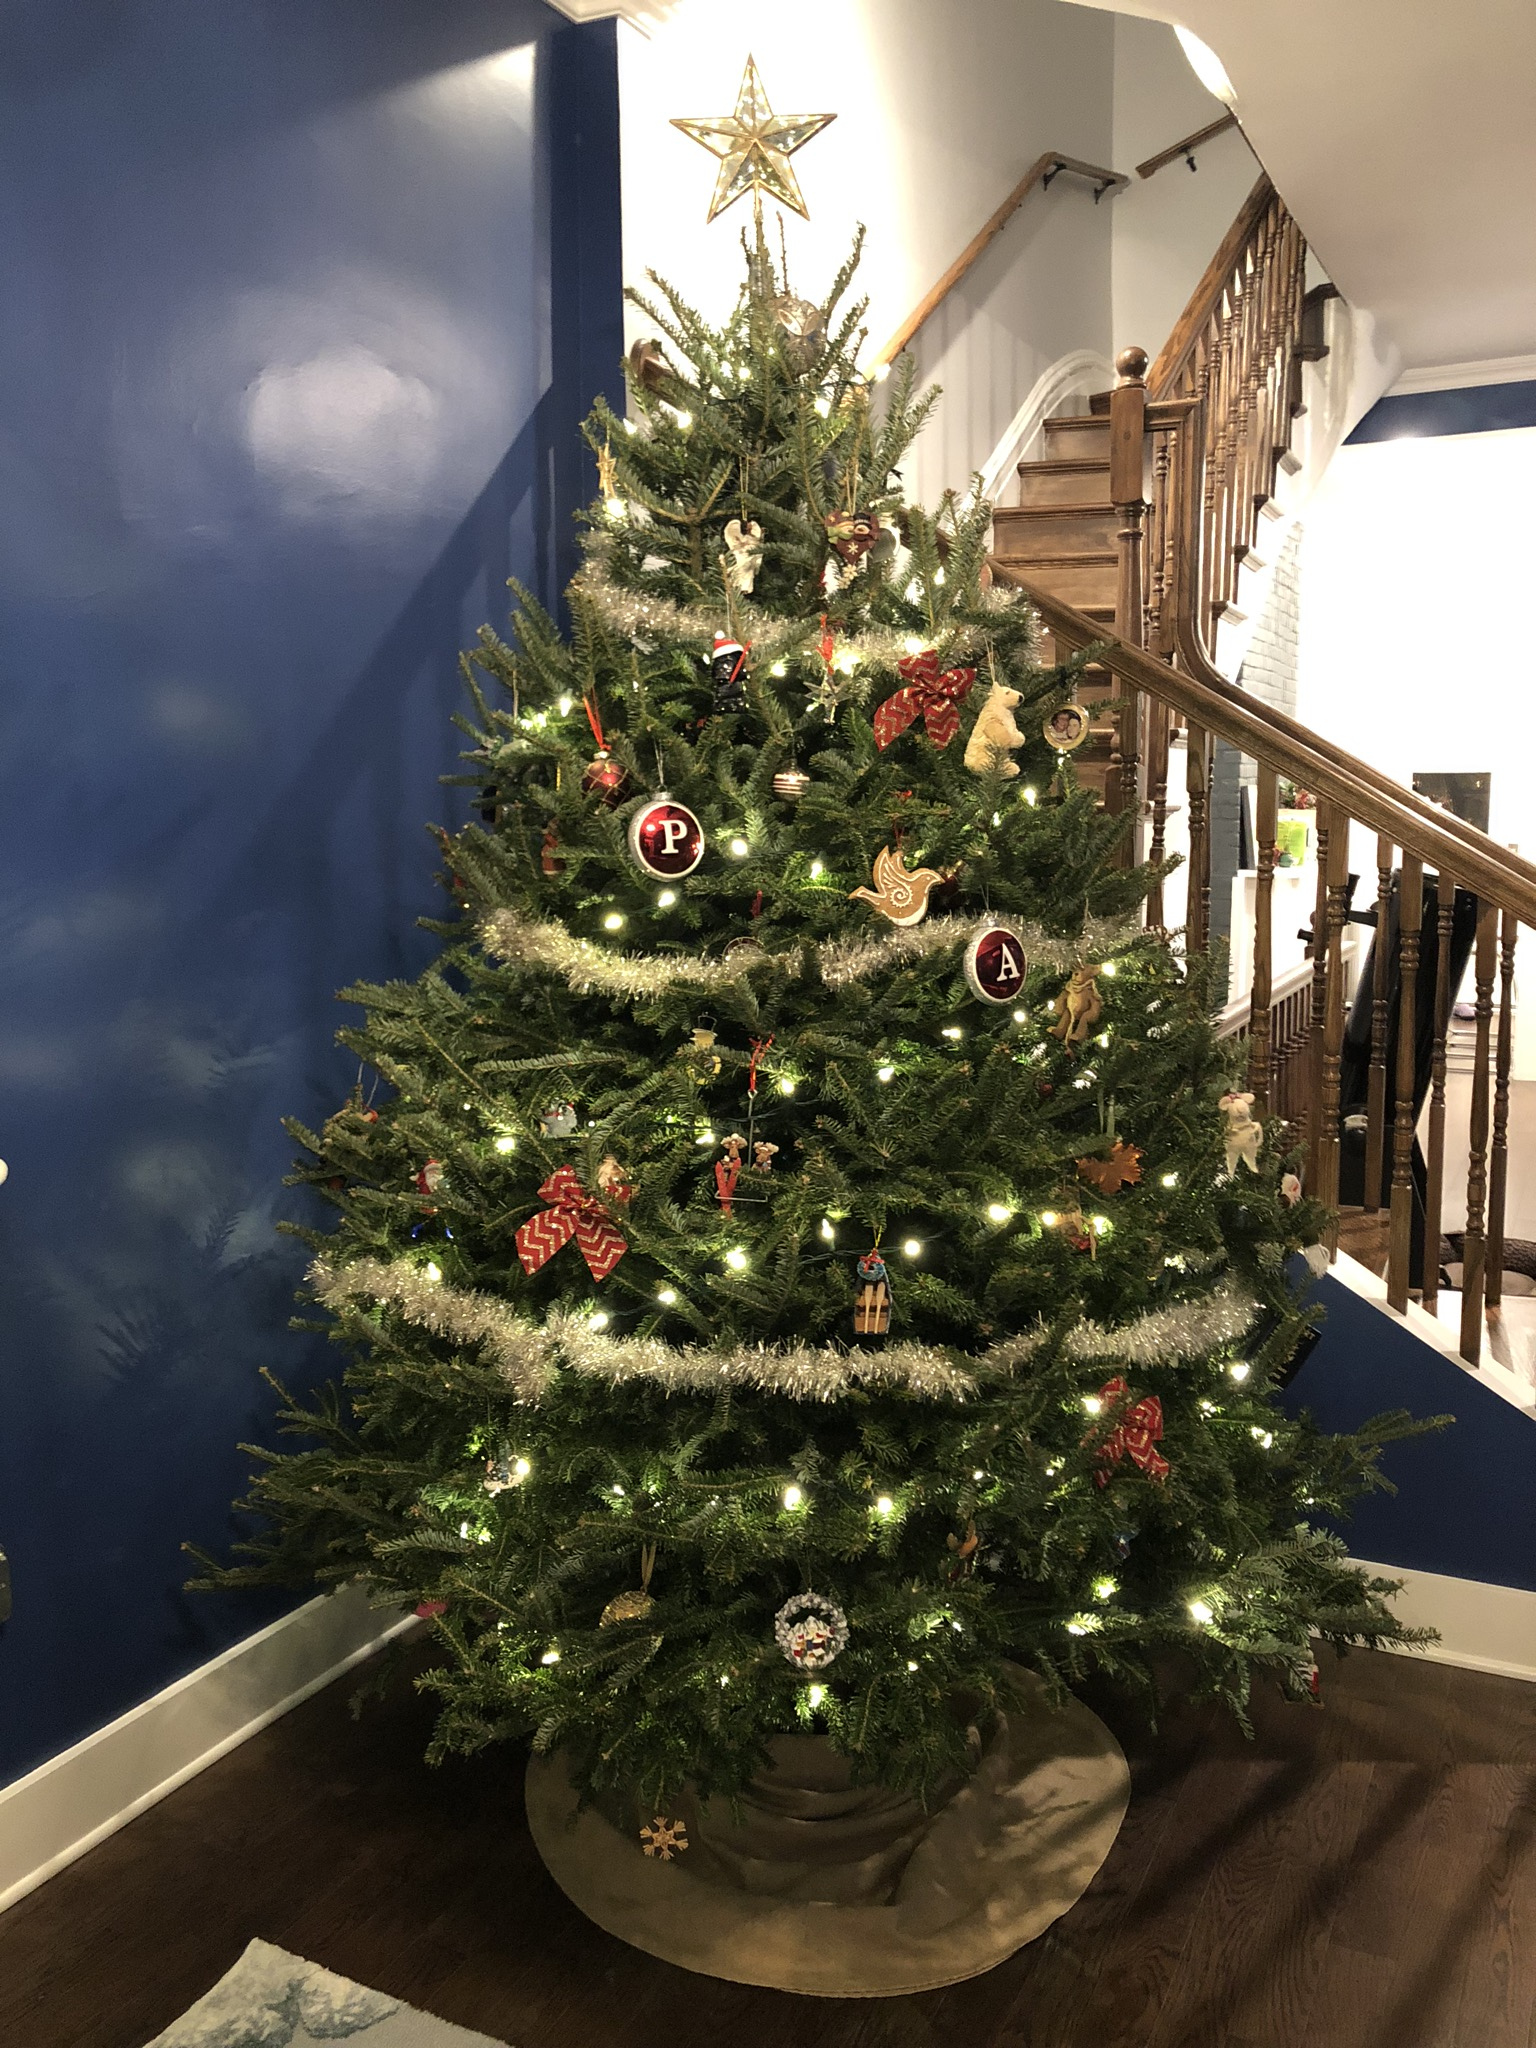 Last year's Christmas tree